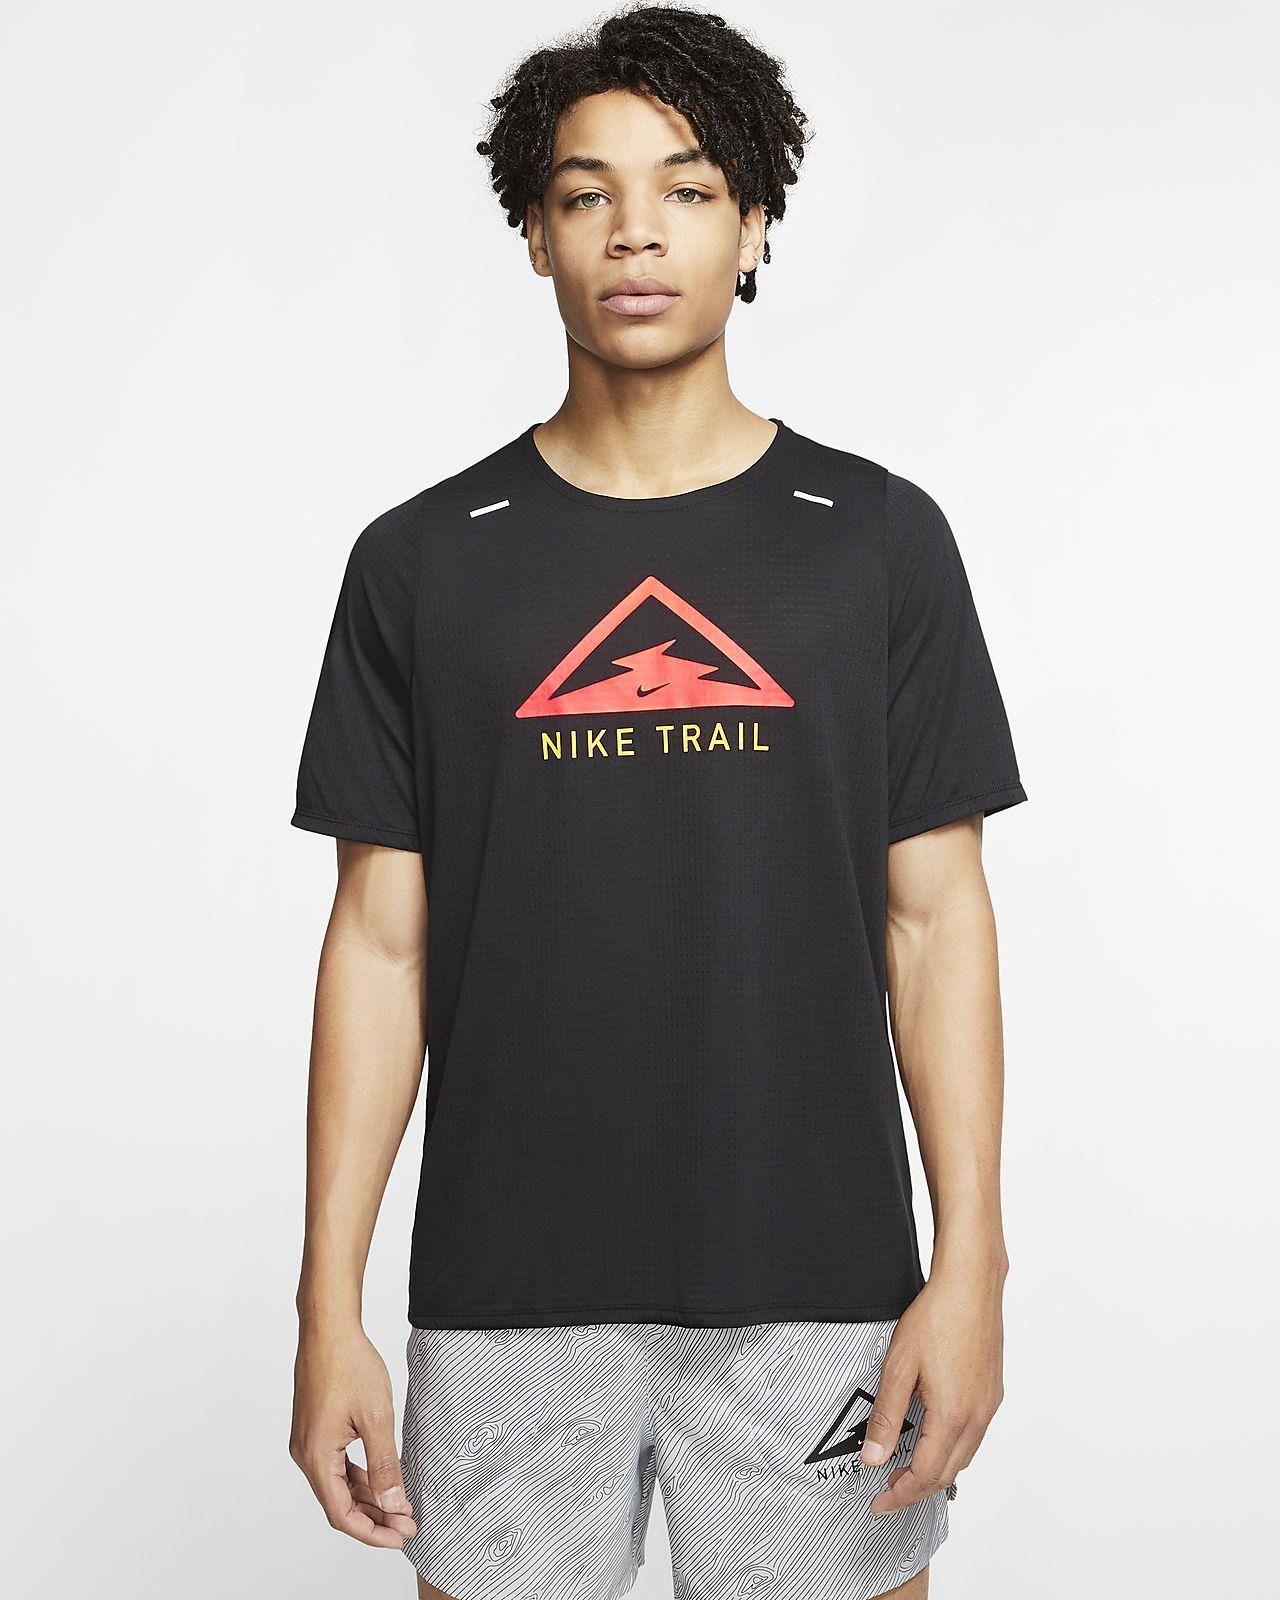 Nike Rise 365 Trail Samarreta de trail running sense mànigues - Home